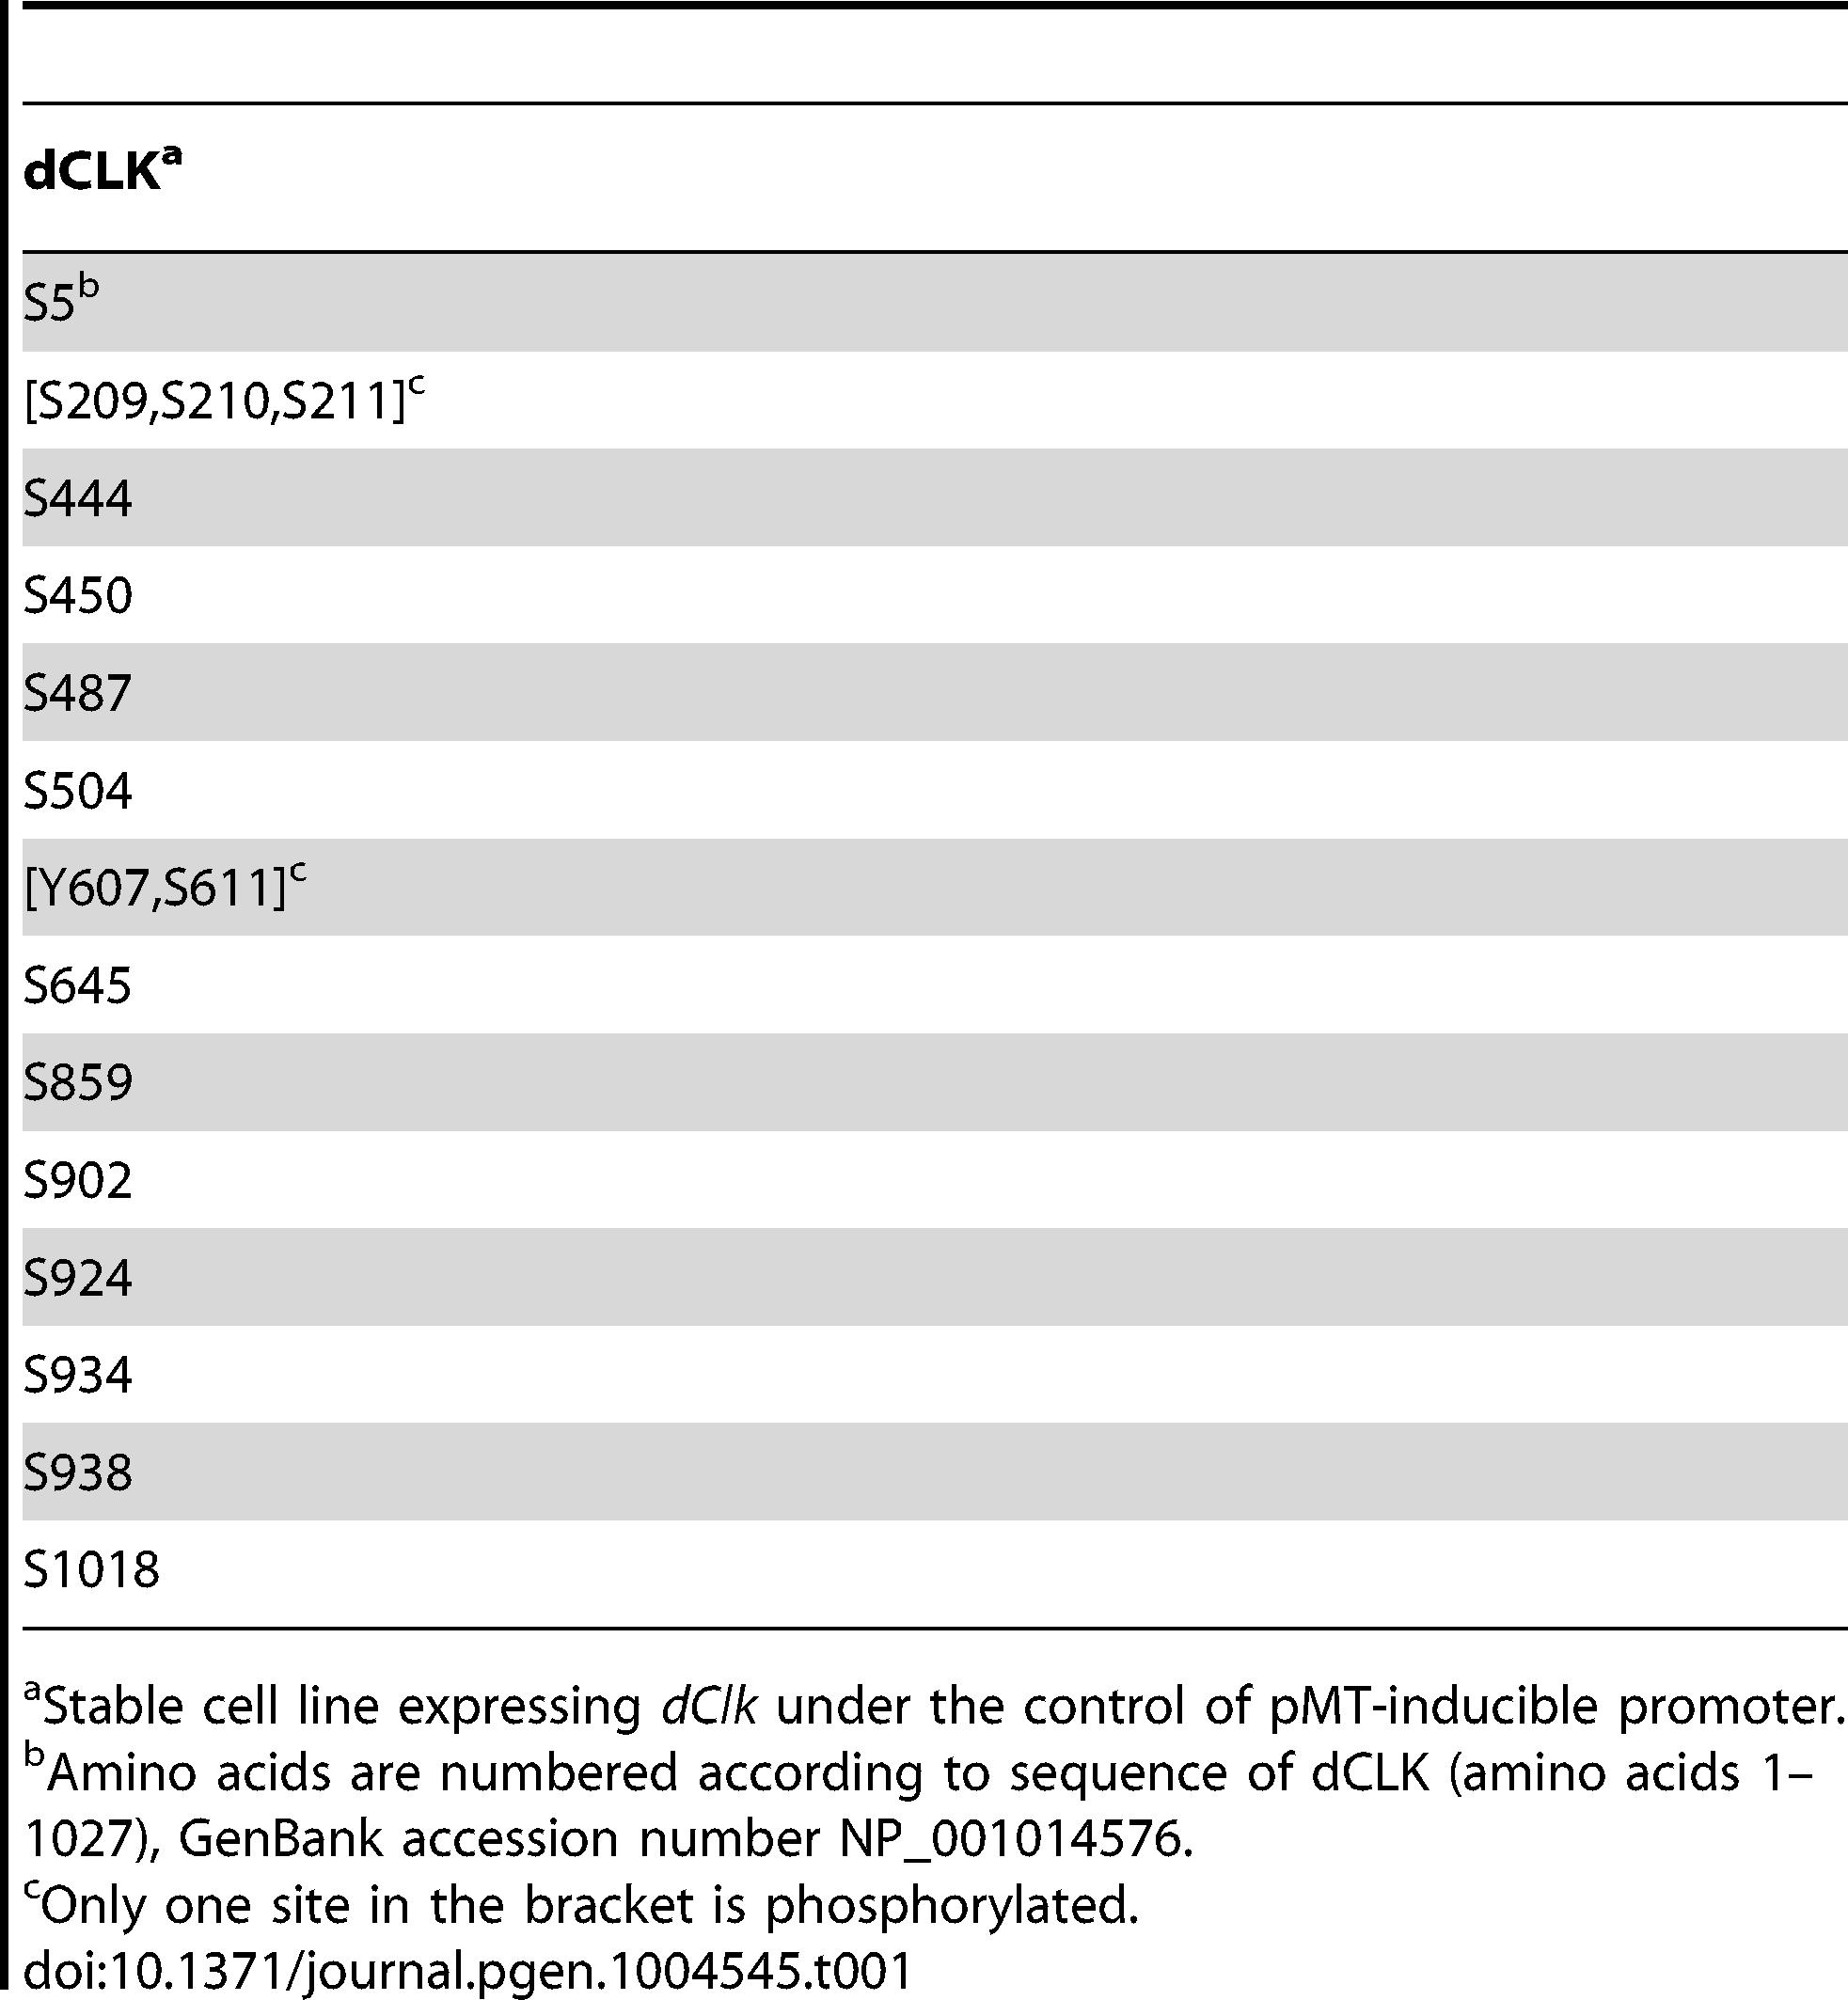 Identification of phosphorylation sites on dCLK produced in <i>Drosophila</i> S2 cells.